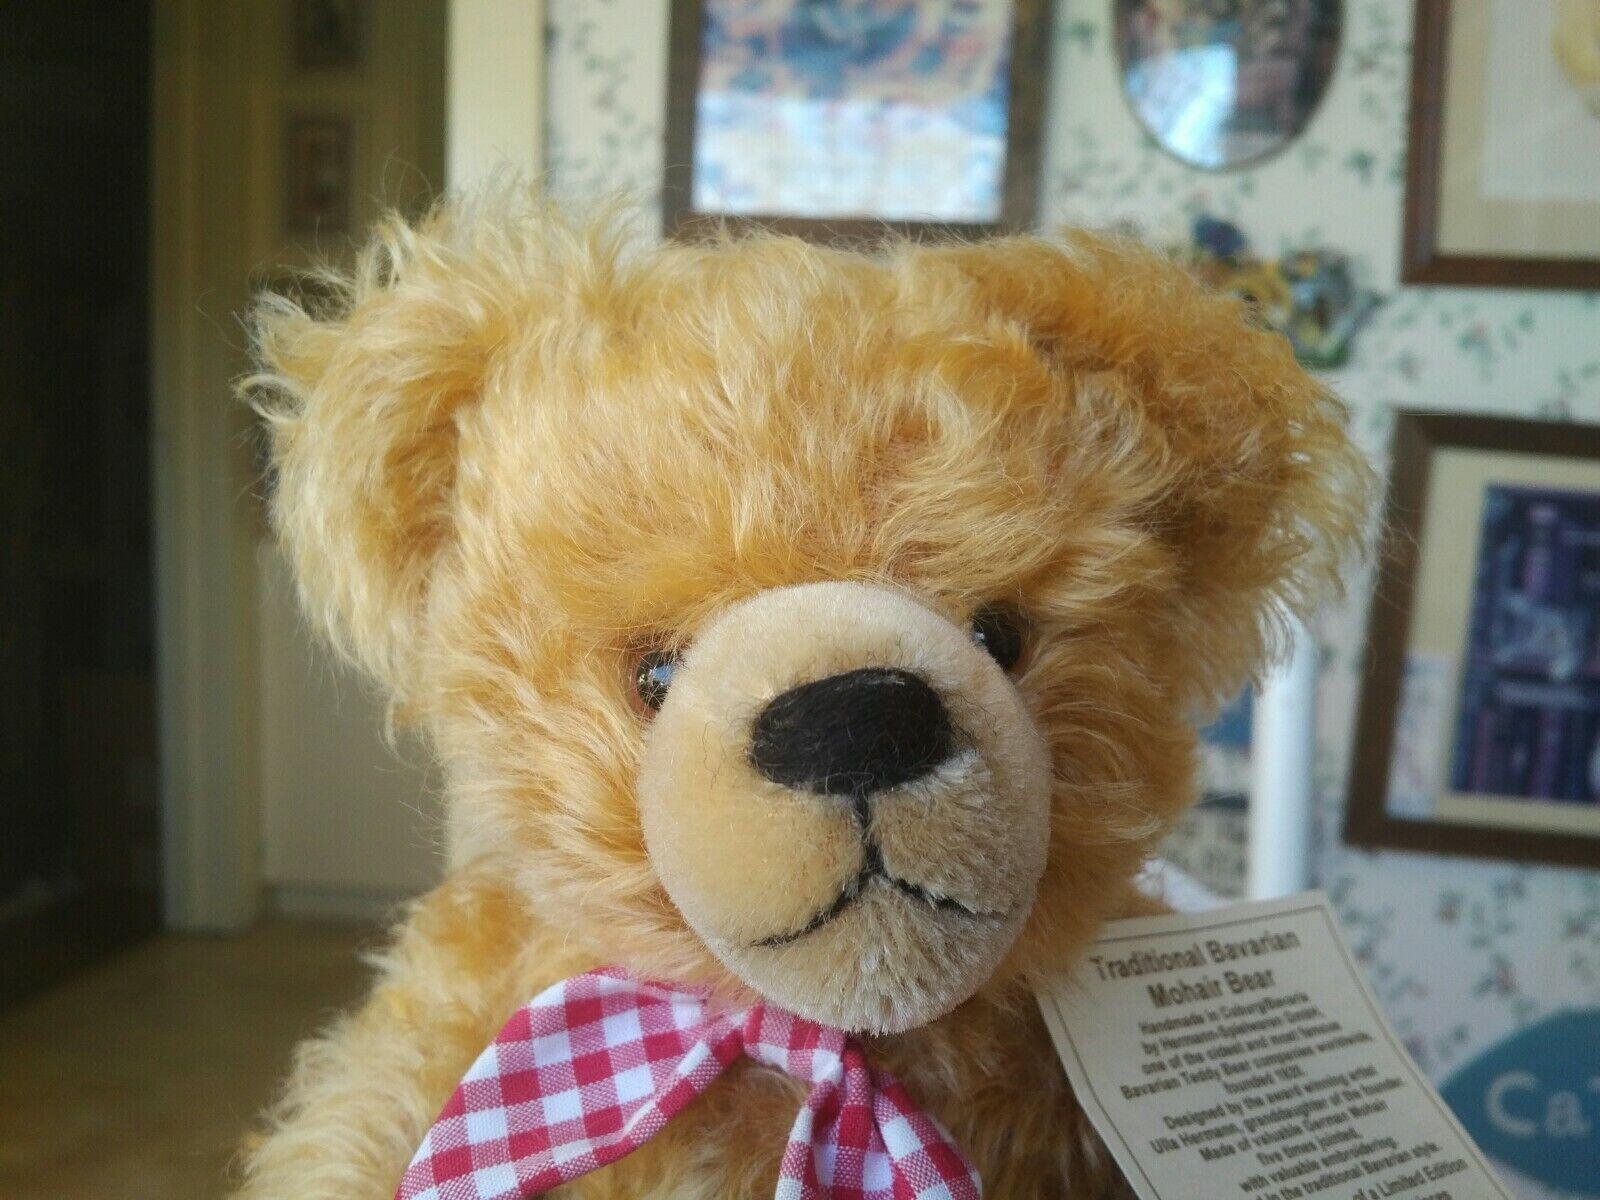 Limited Edition Hermann Spielwaren Bavarian Teddy Bear #173 of 33 14in EUC